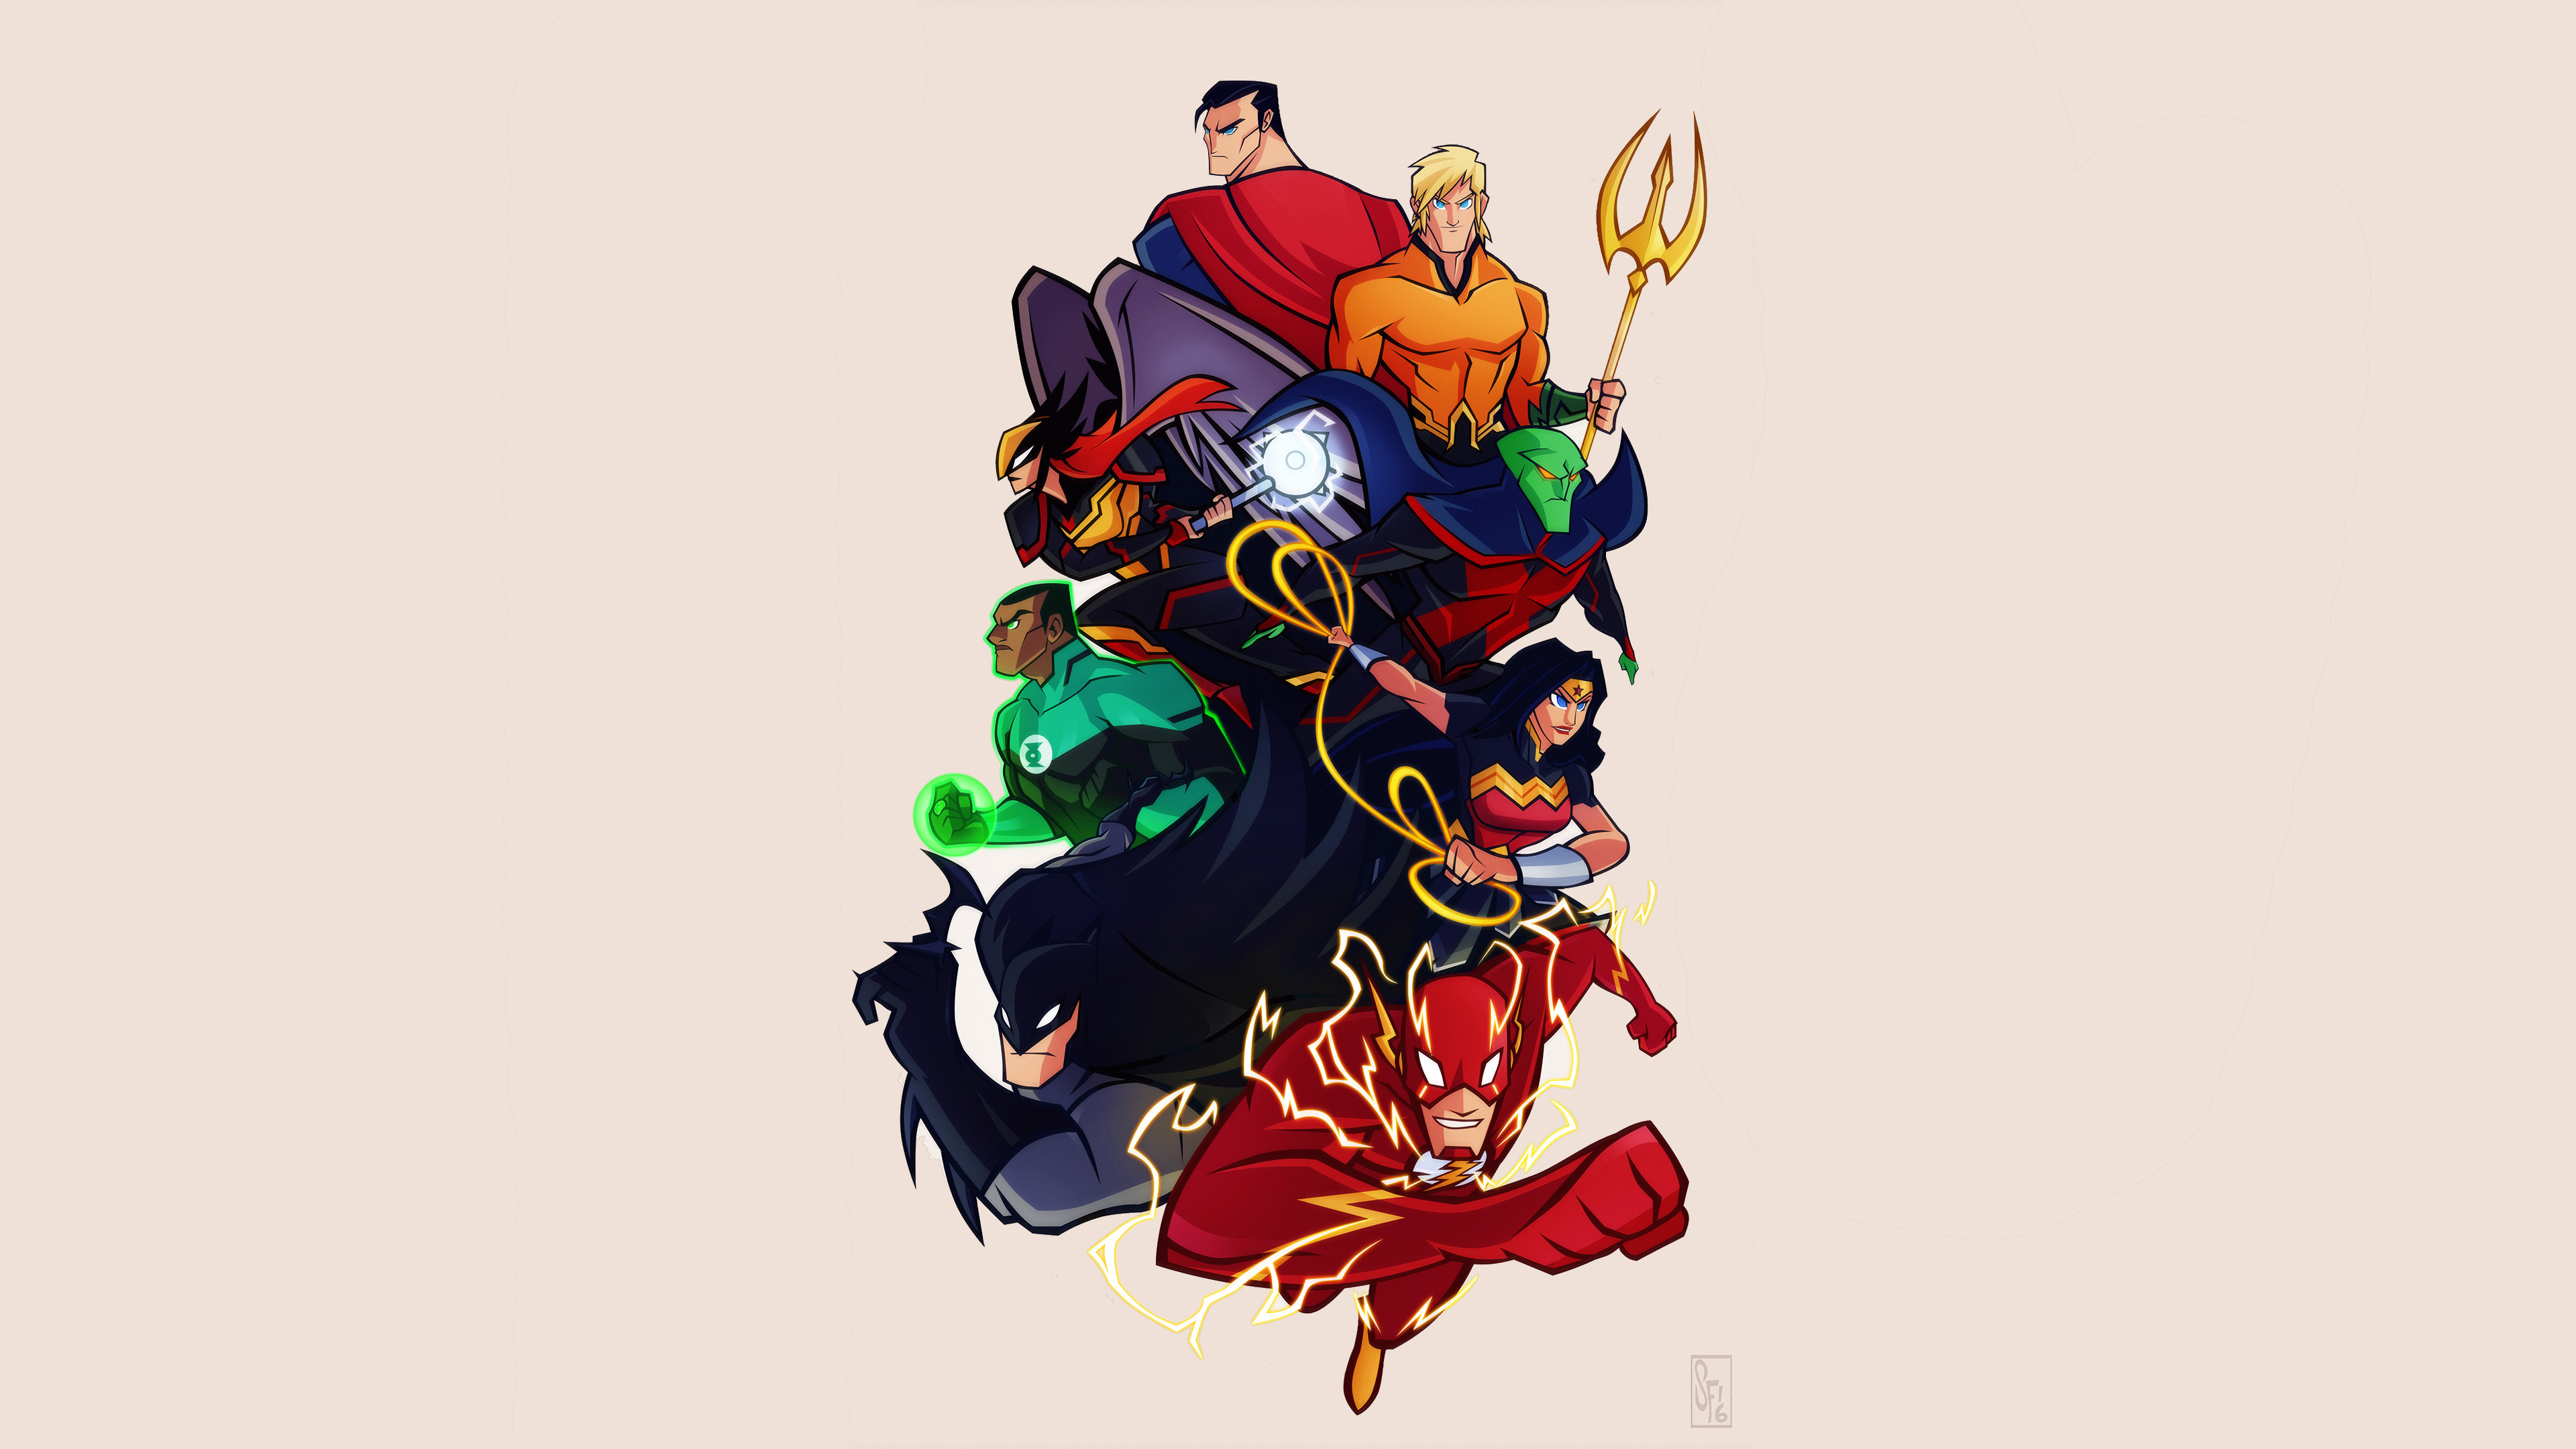 1280x2120 Justice League Cartoon Comic Artwork 4k iPhone 6 ...